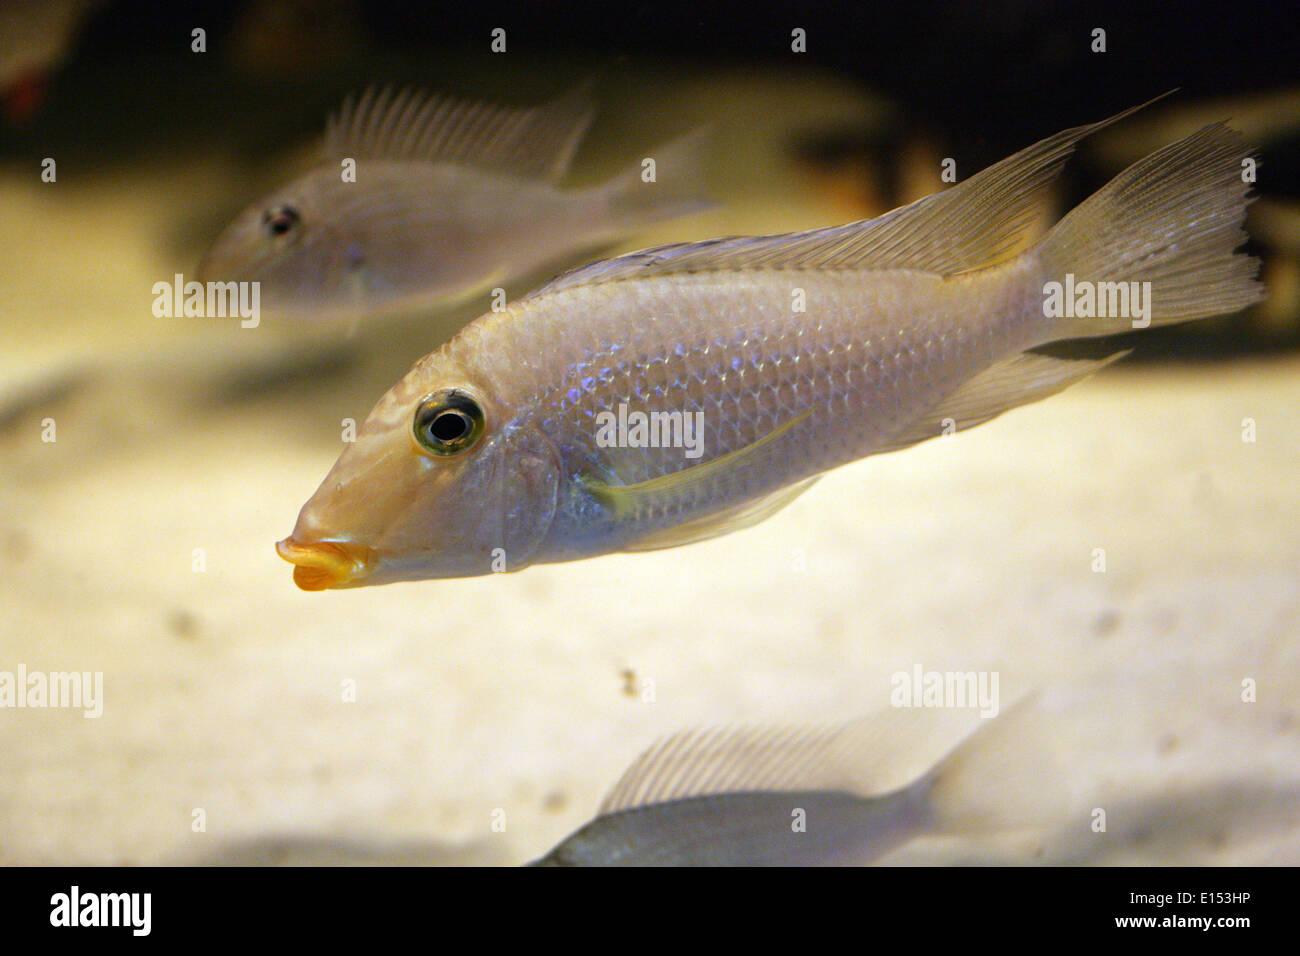 Demon Earth Eater, Satanoperca jurupari, Cichlidae, Perciformes, Actinopterygii, Chordata. Amazon River Basin, South America. - Stock Image